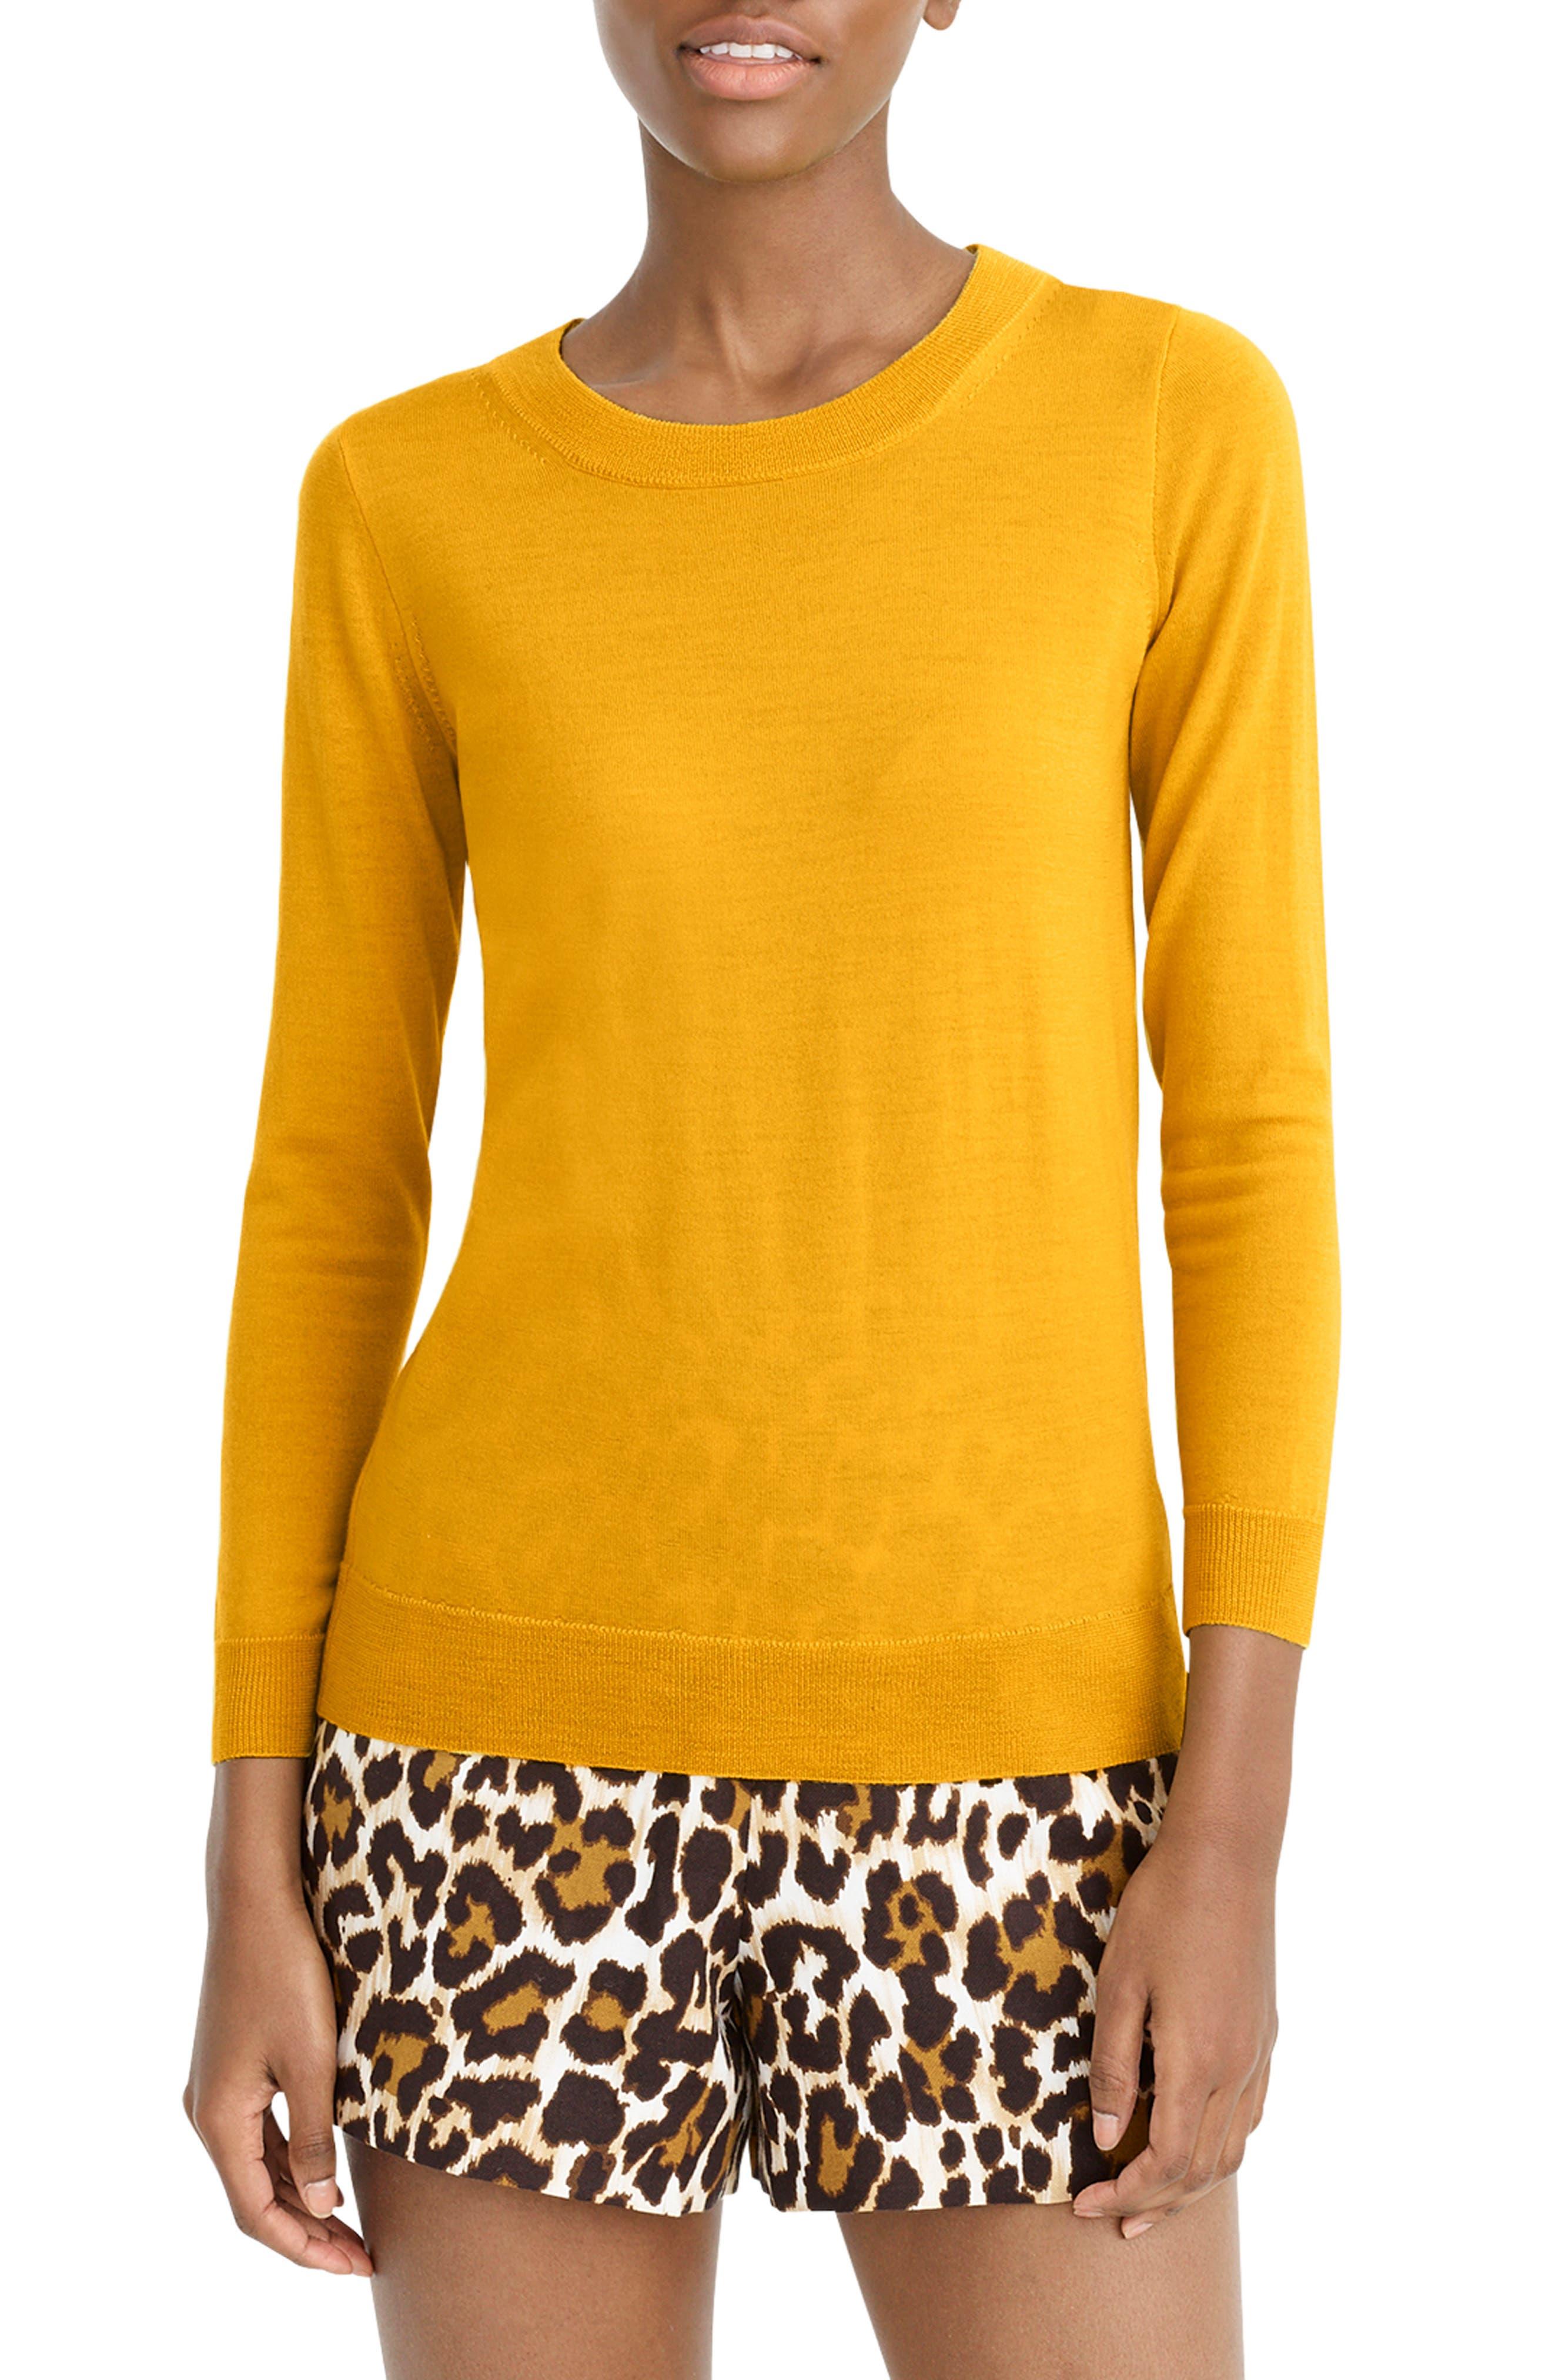 J.crew Tippi Merino Wool Sweater, Metallic